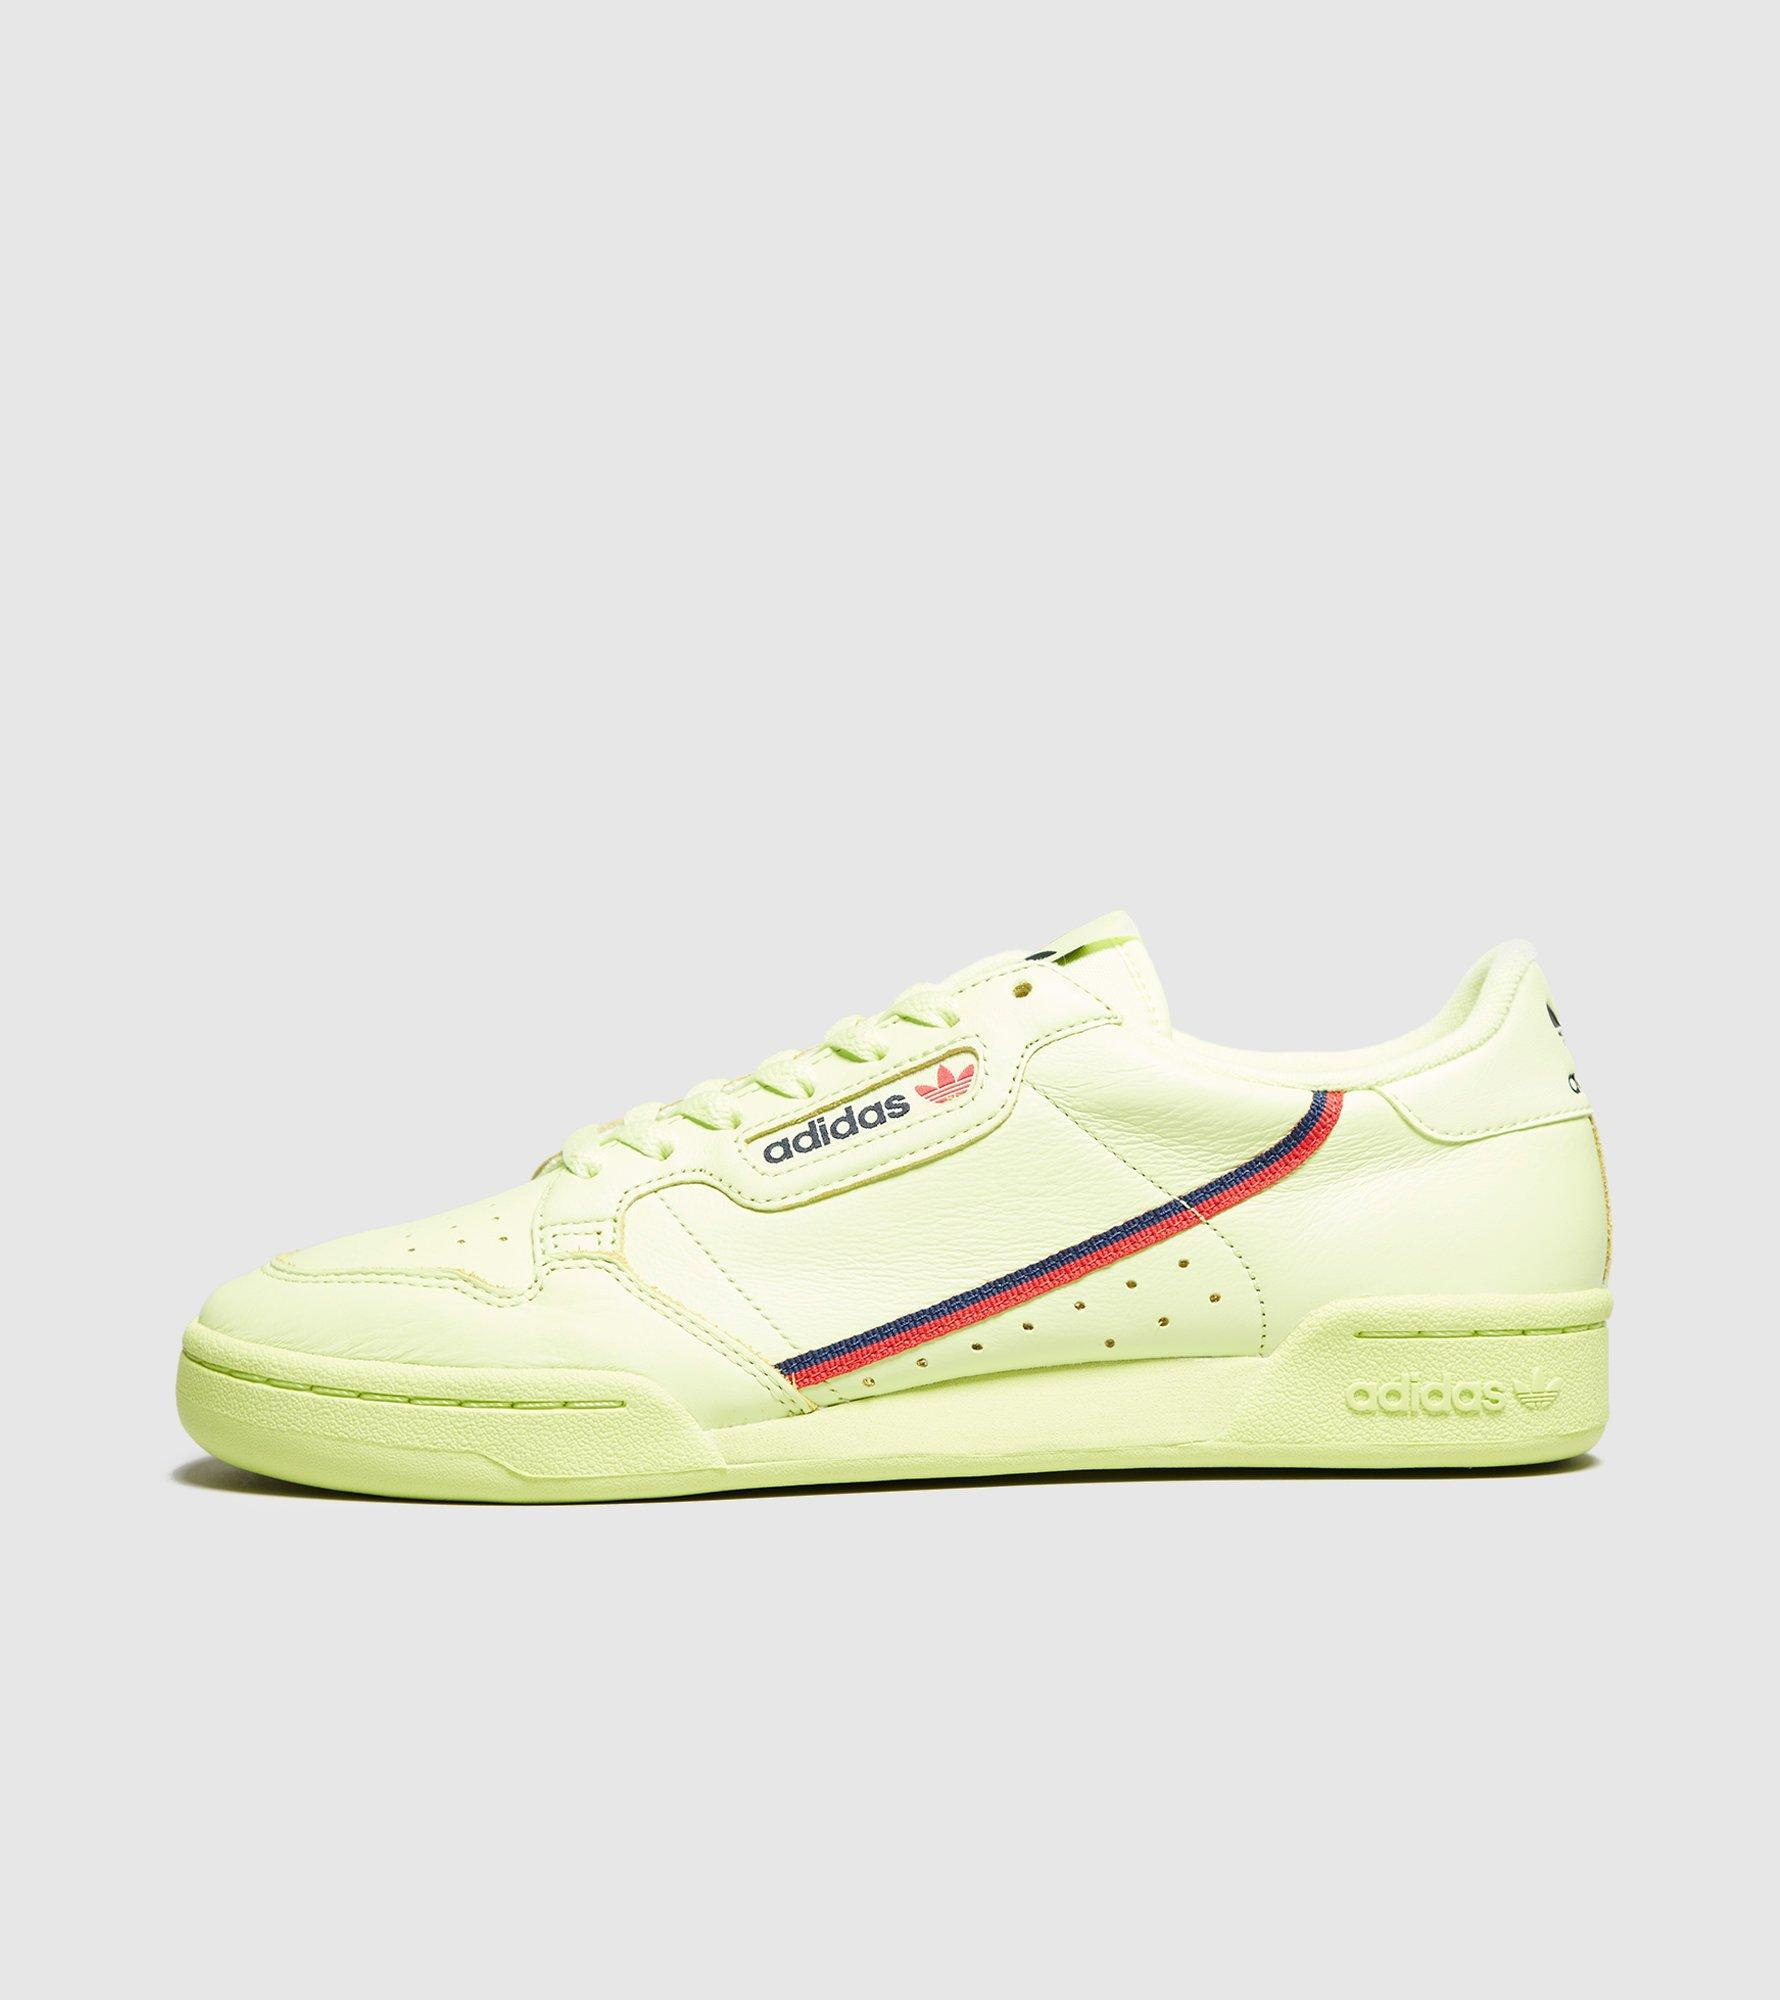 buy online 2de1b b12b1 Lyst - adidas Originals Continental 80 in Yellow for Men